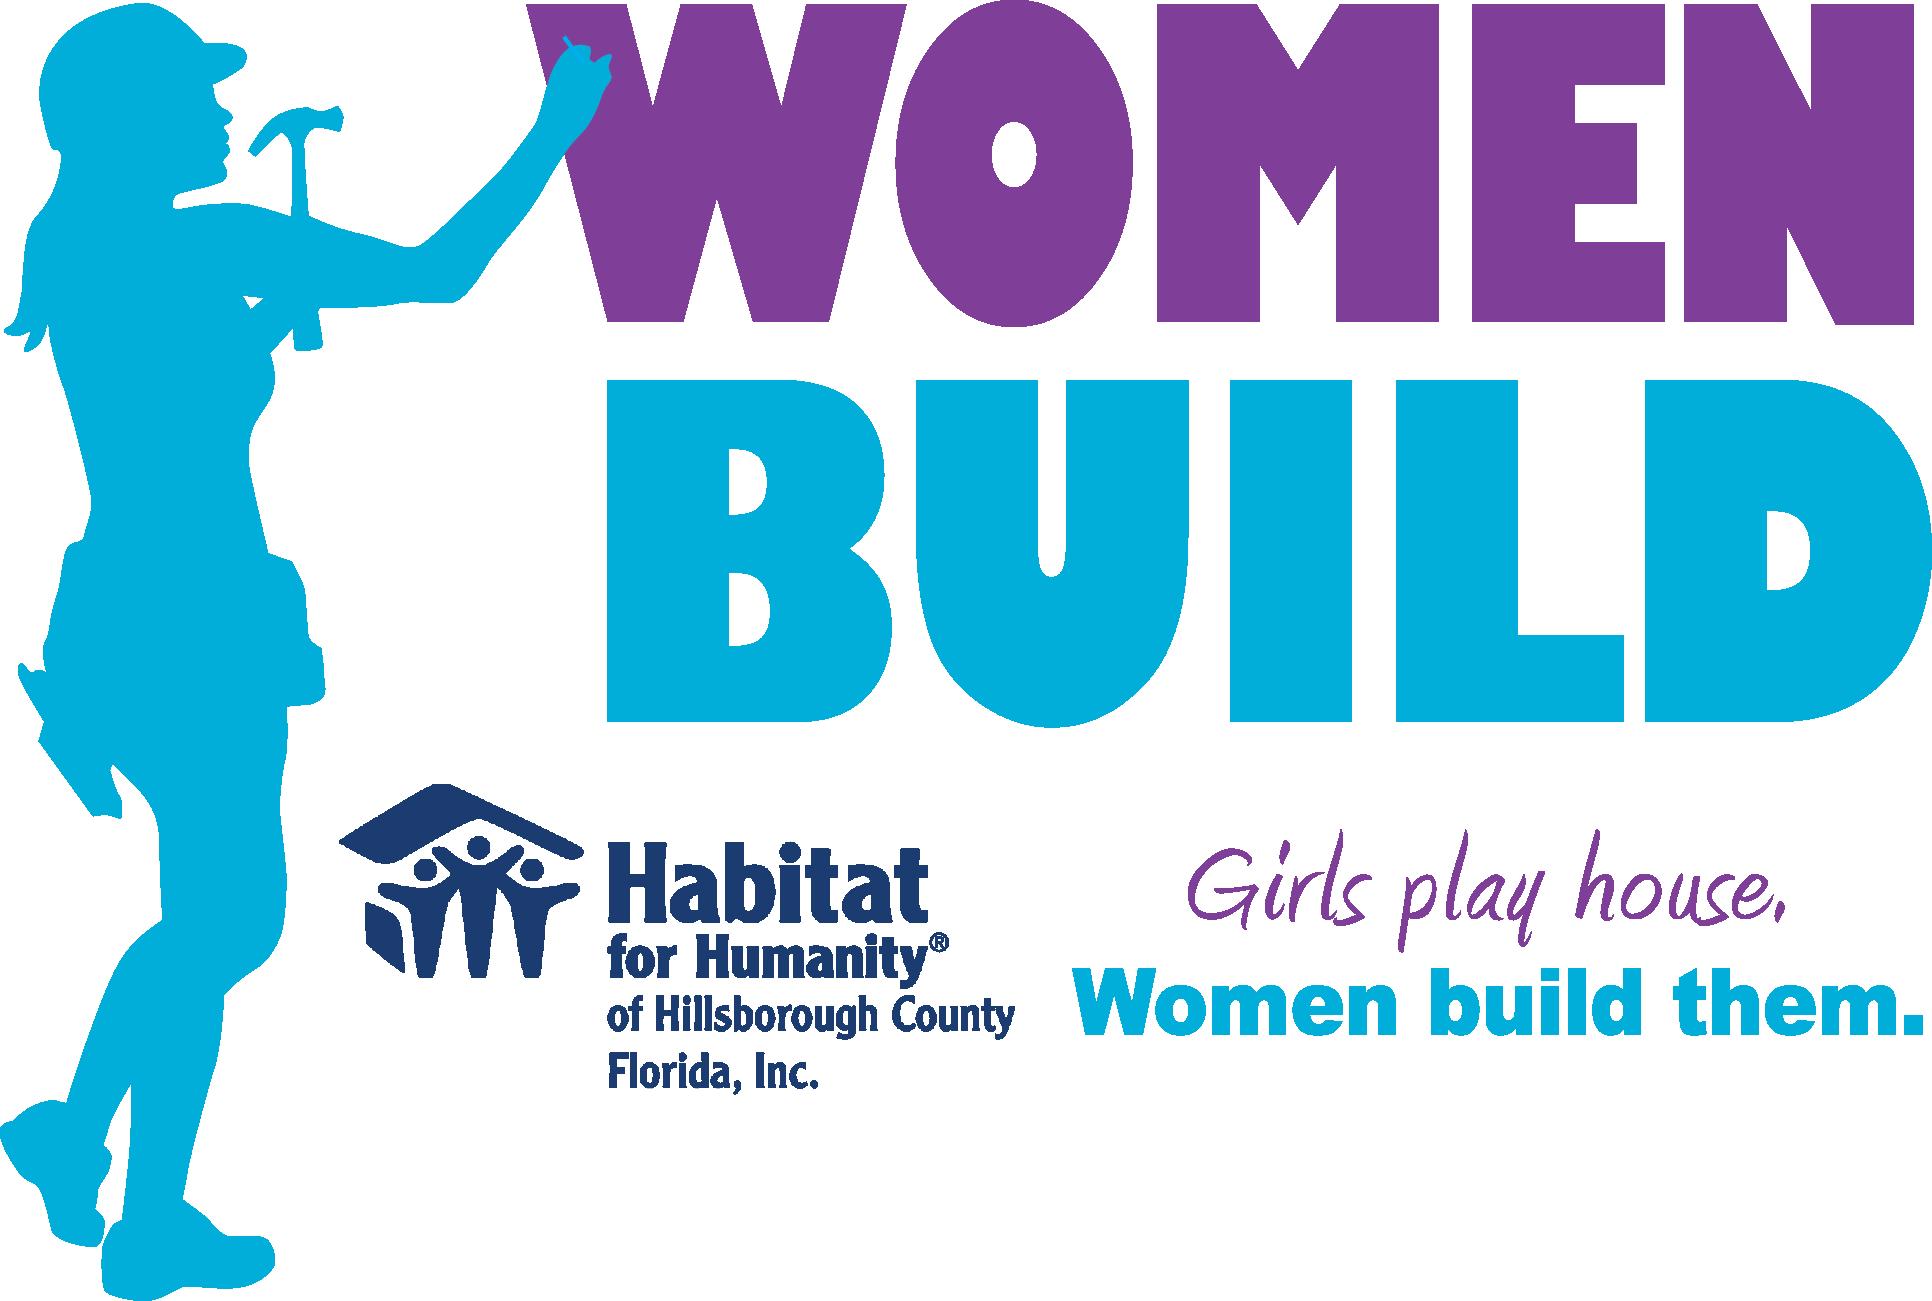 HfHHC WomenBuild logo (2).png